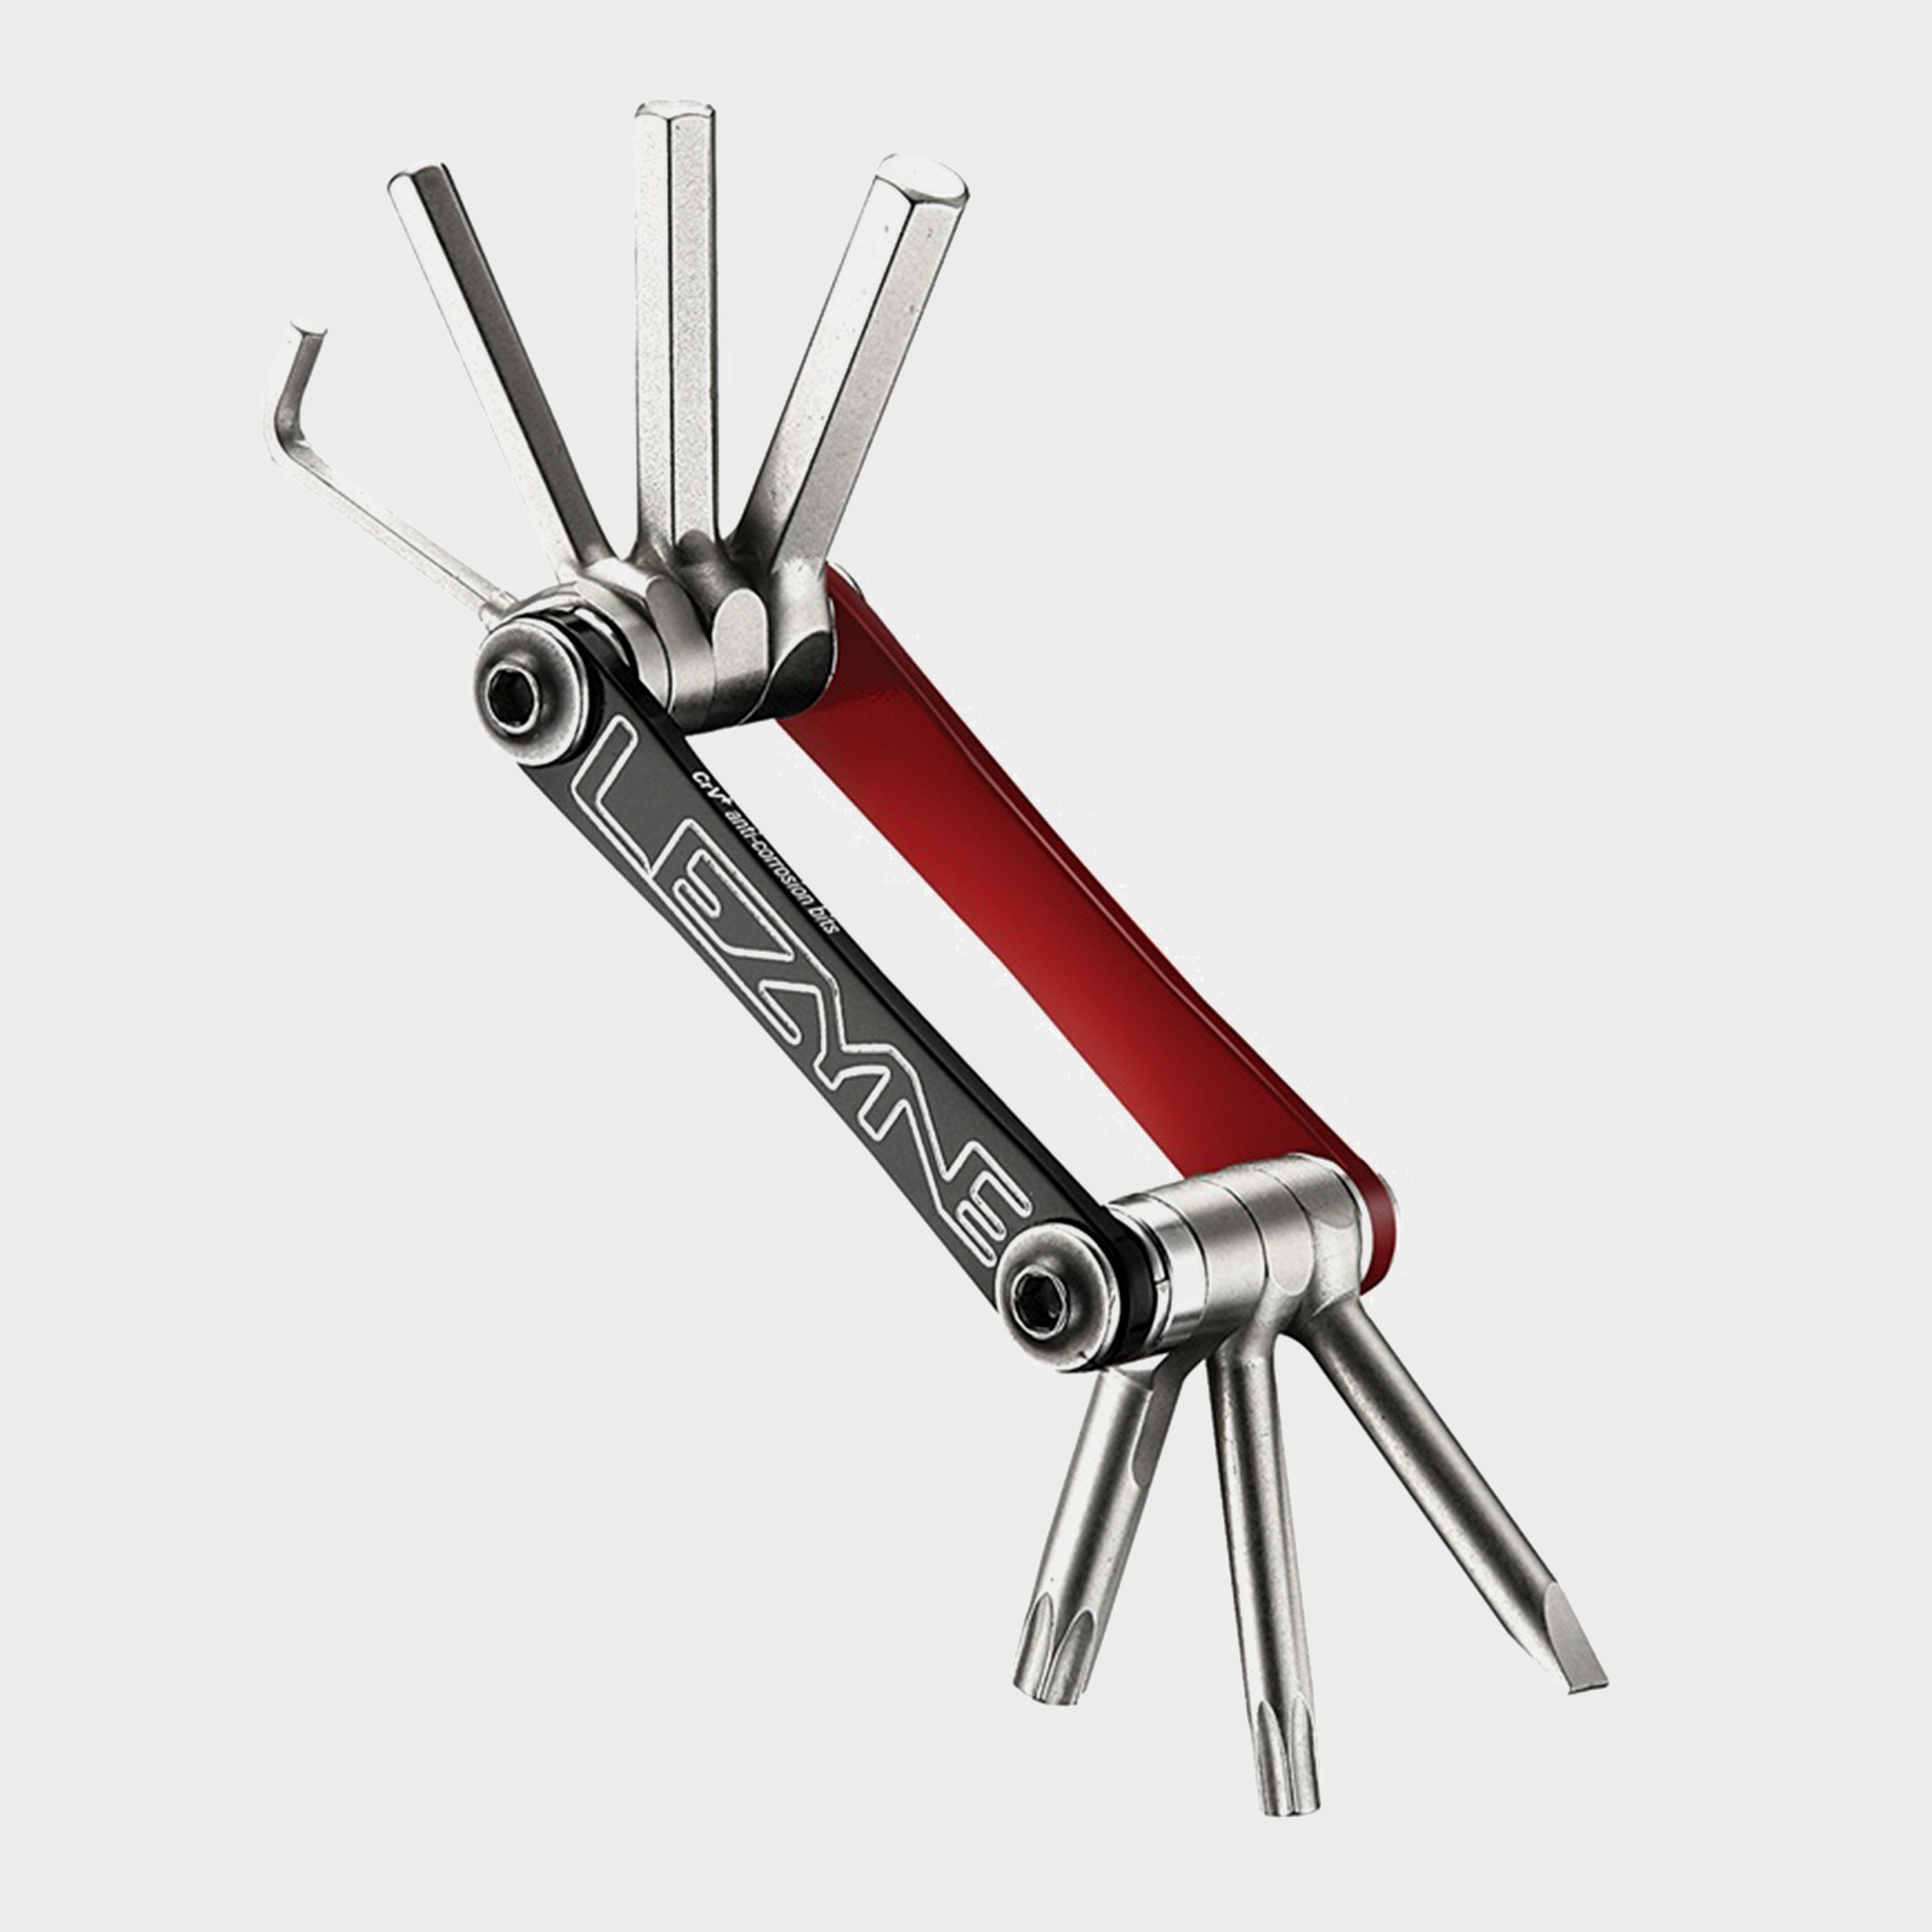 LEZYNE V7 Multi-Tool